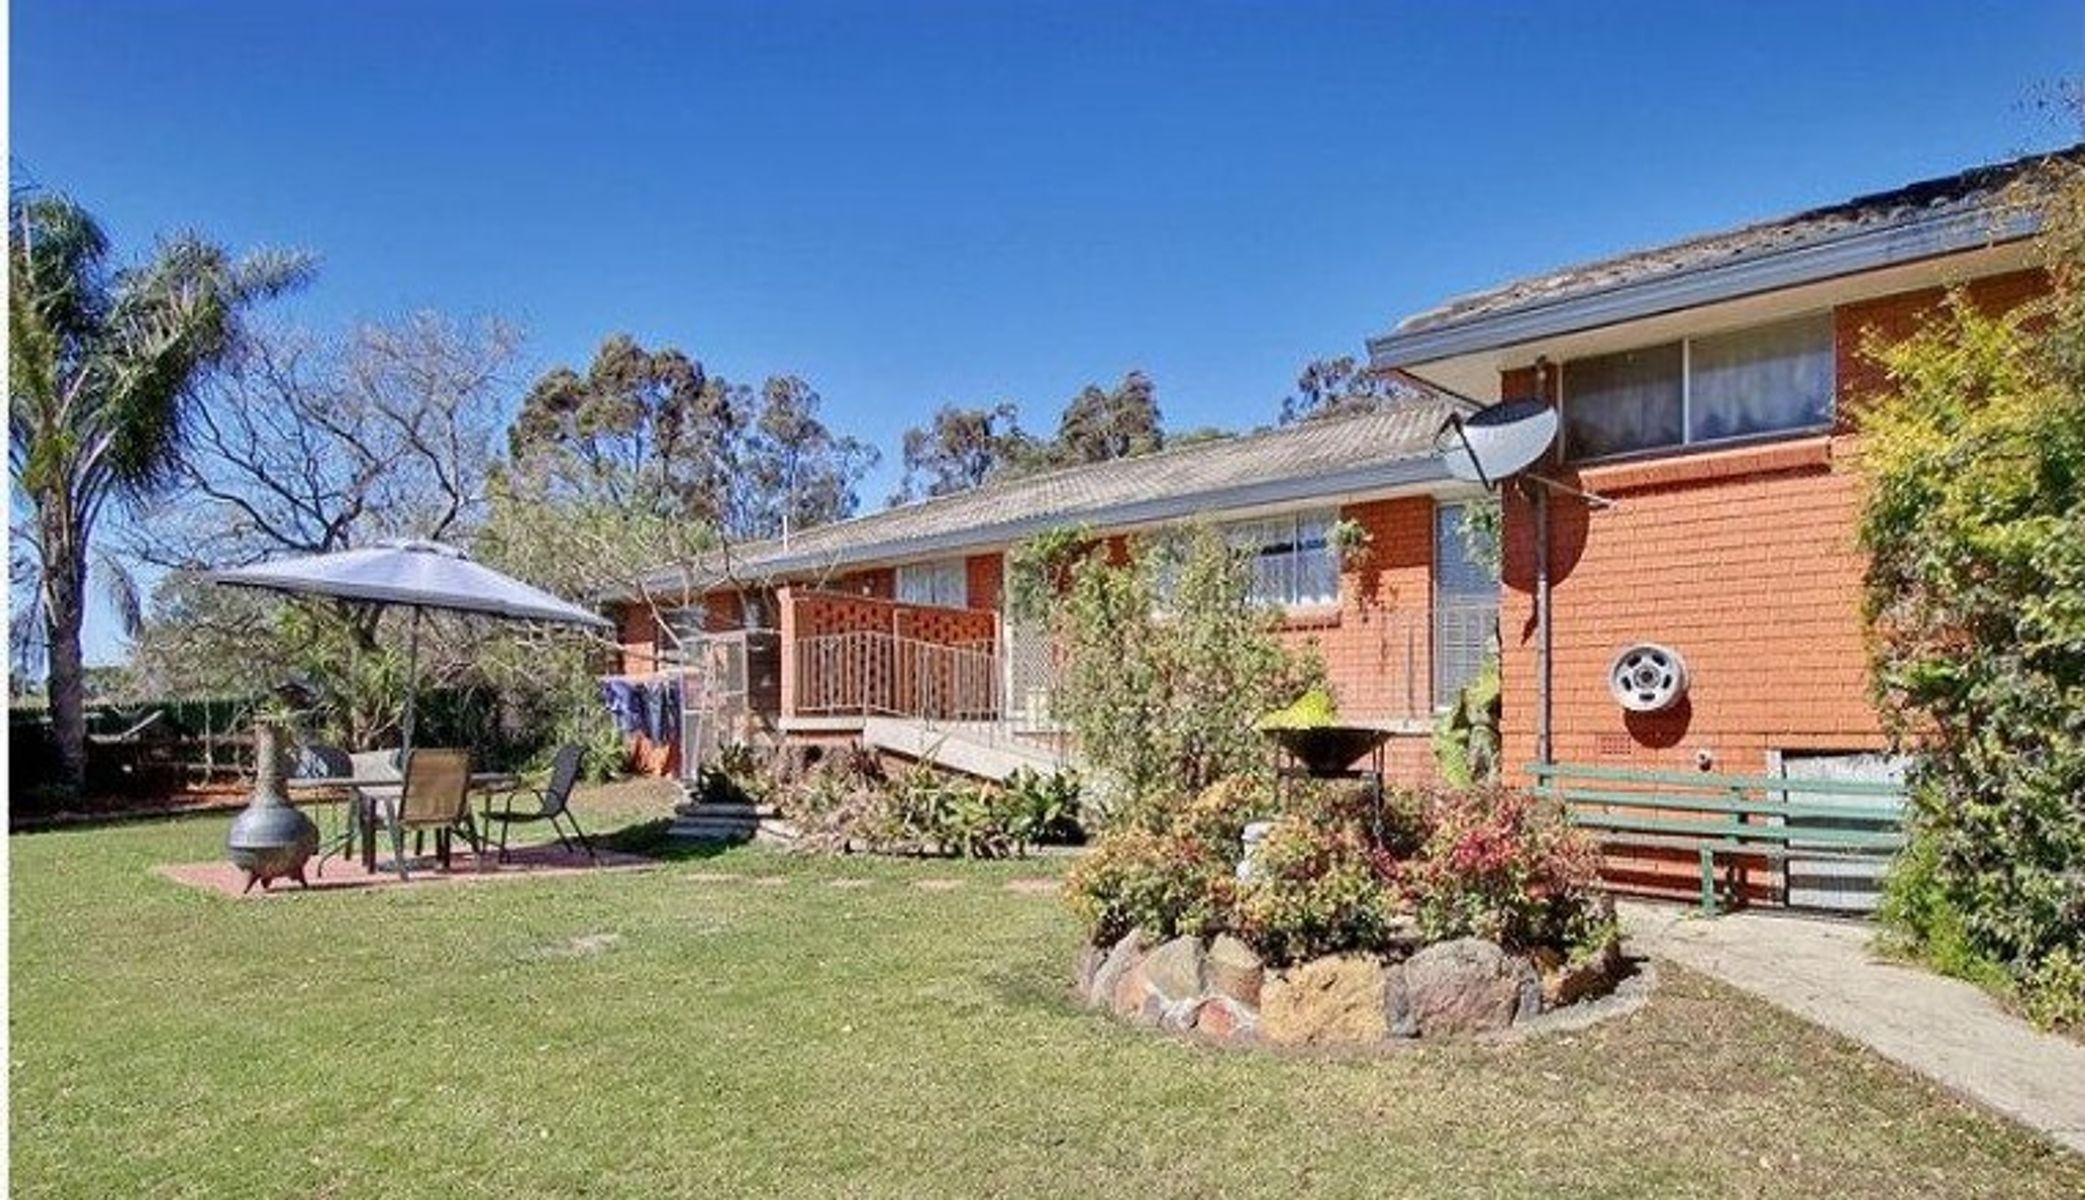 476 Kurmond Road, Freemans Reach, NSW 2756